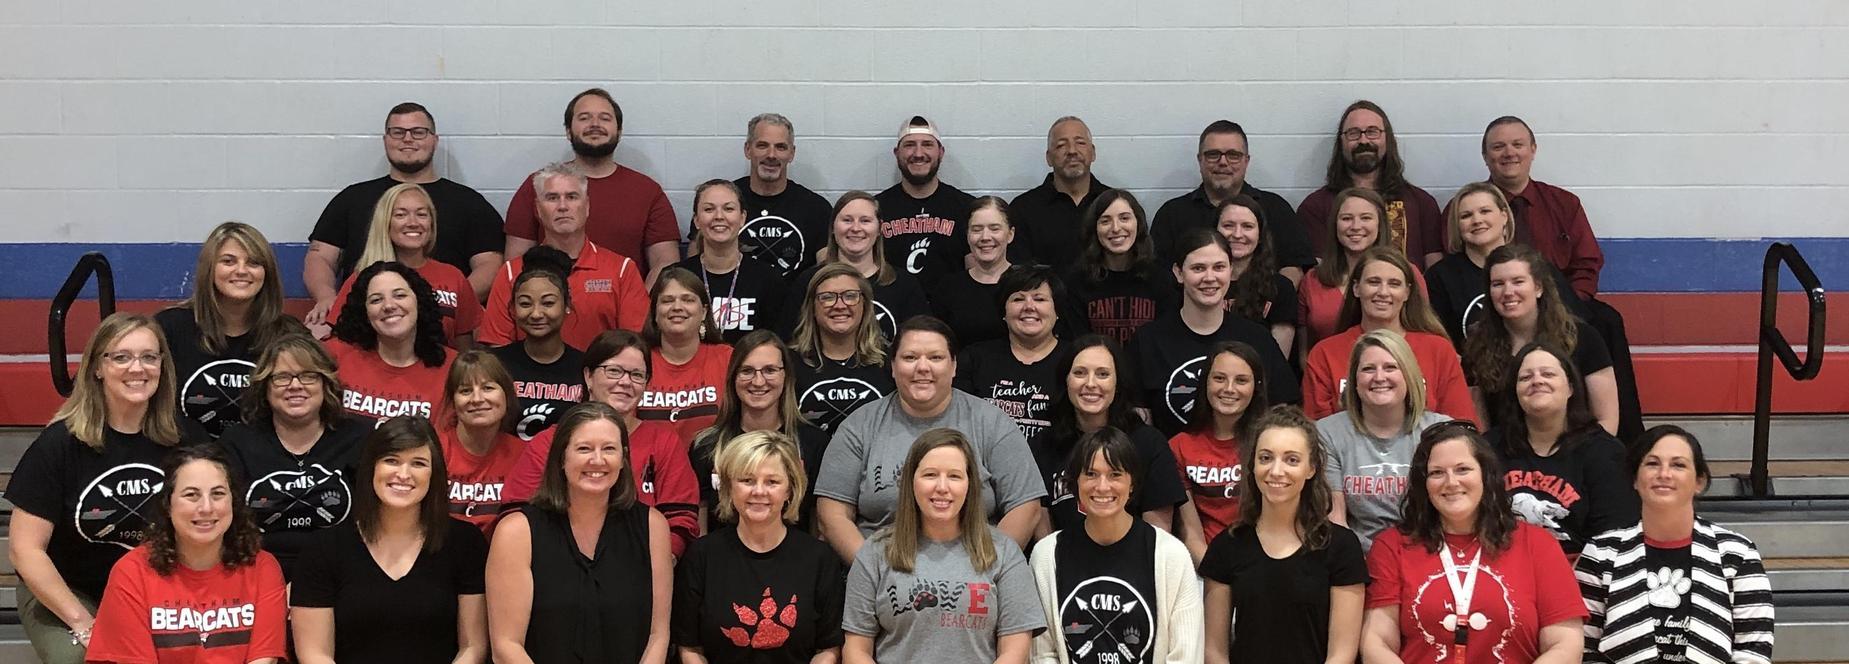 CMS Staff 2019-2020